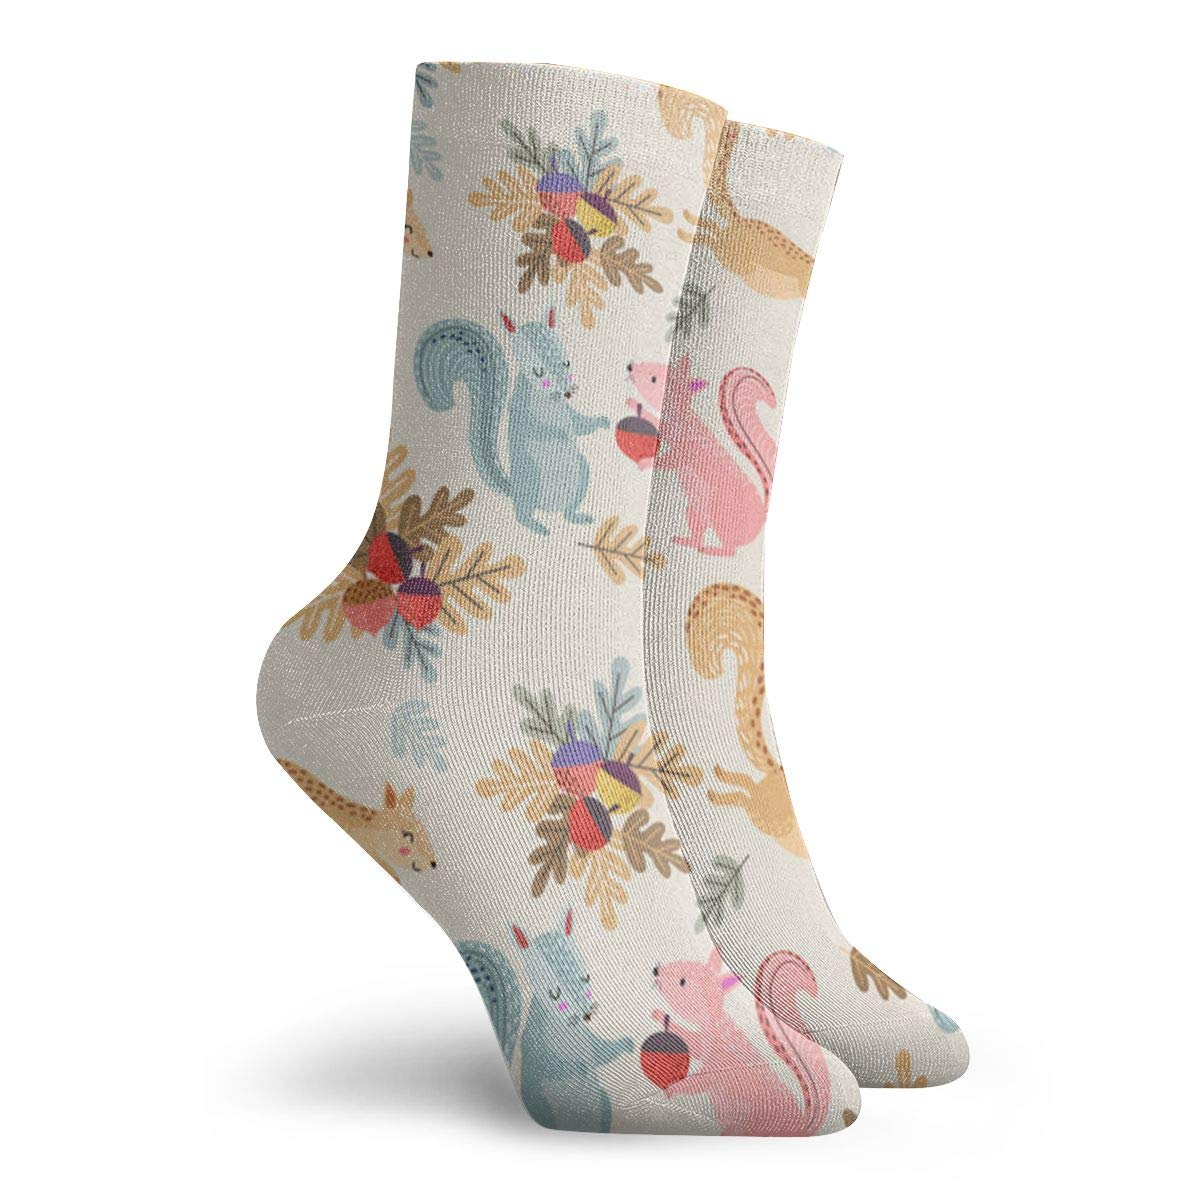 Squirrel Nut Unisex Funny Casual Crew Socks Athletic Socks For Boys Girls Kids Teenagers